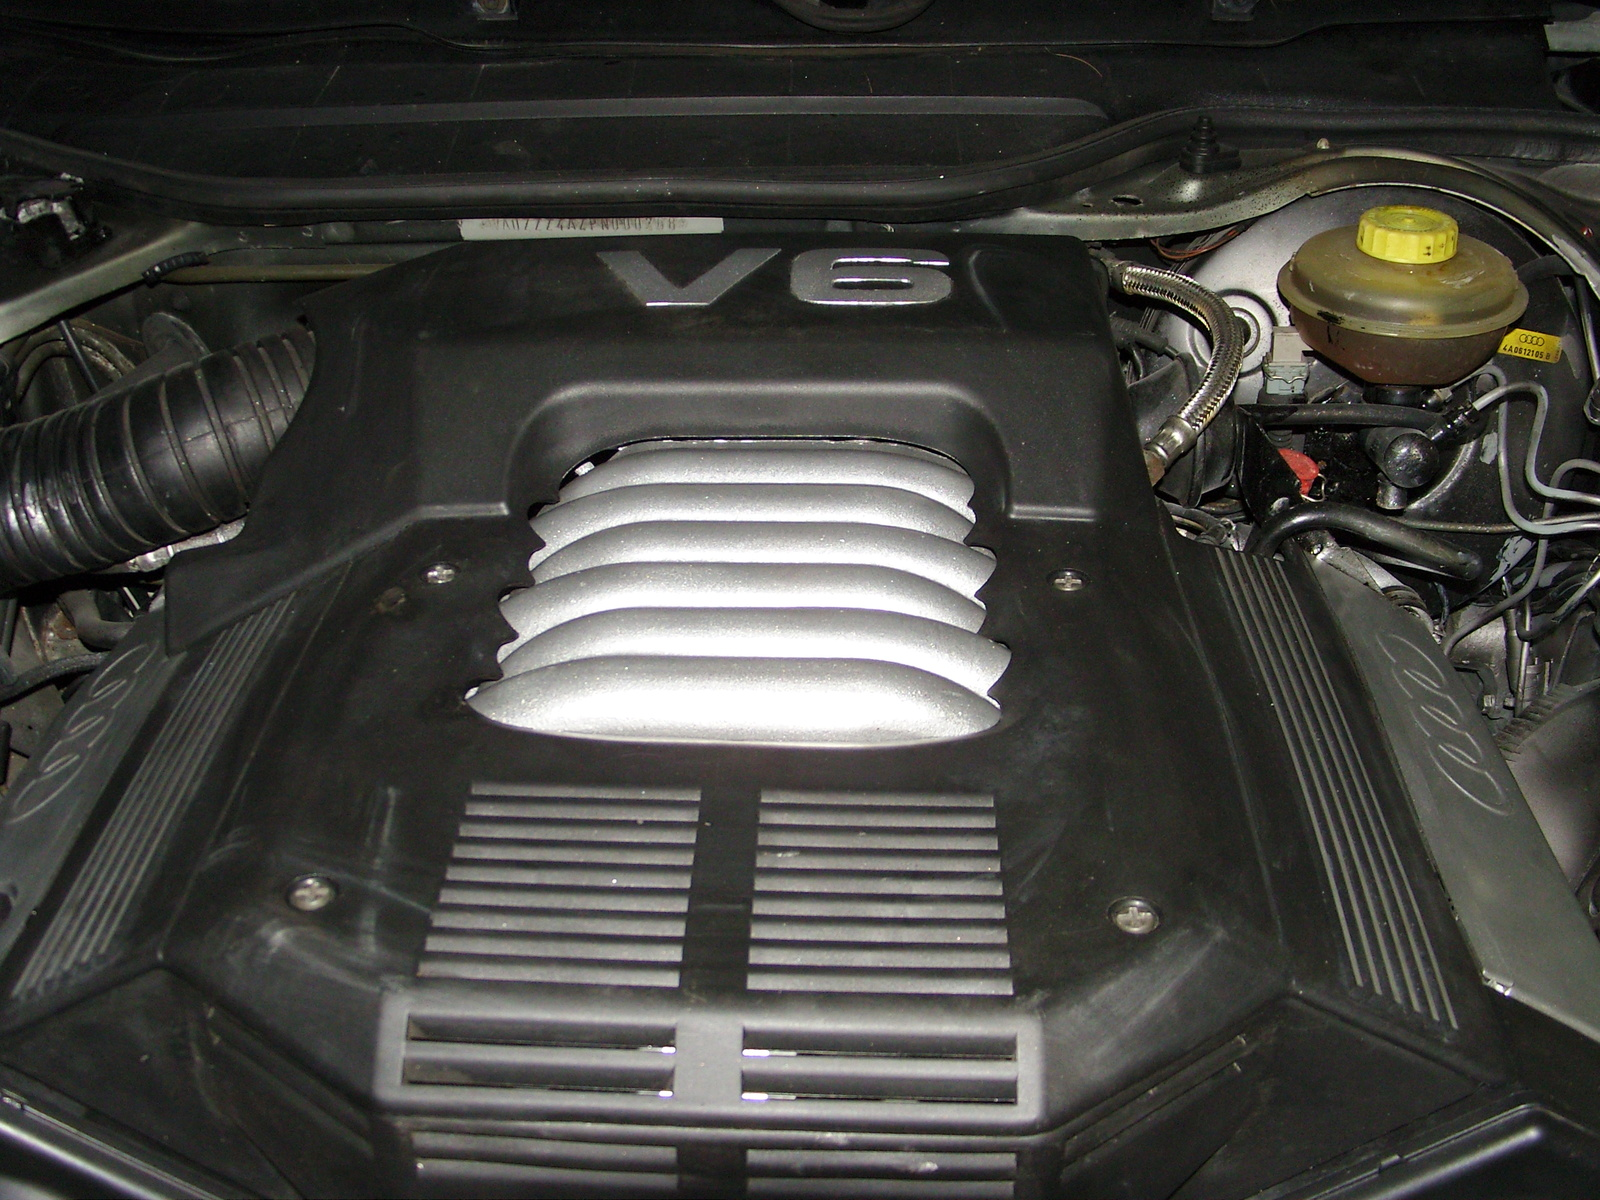 AUDI 100 engine